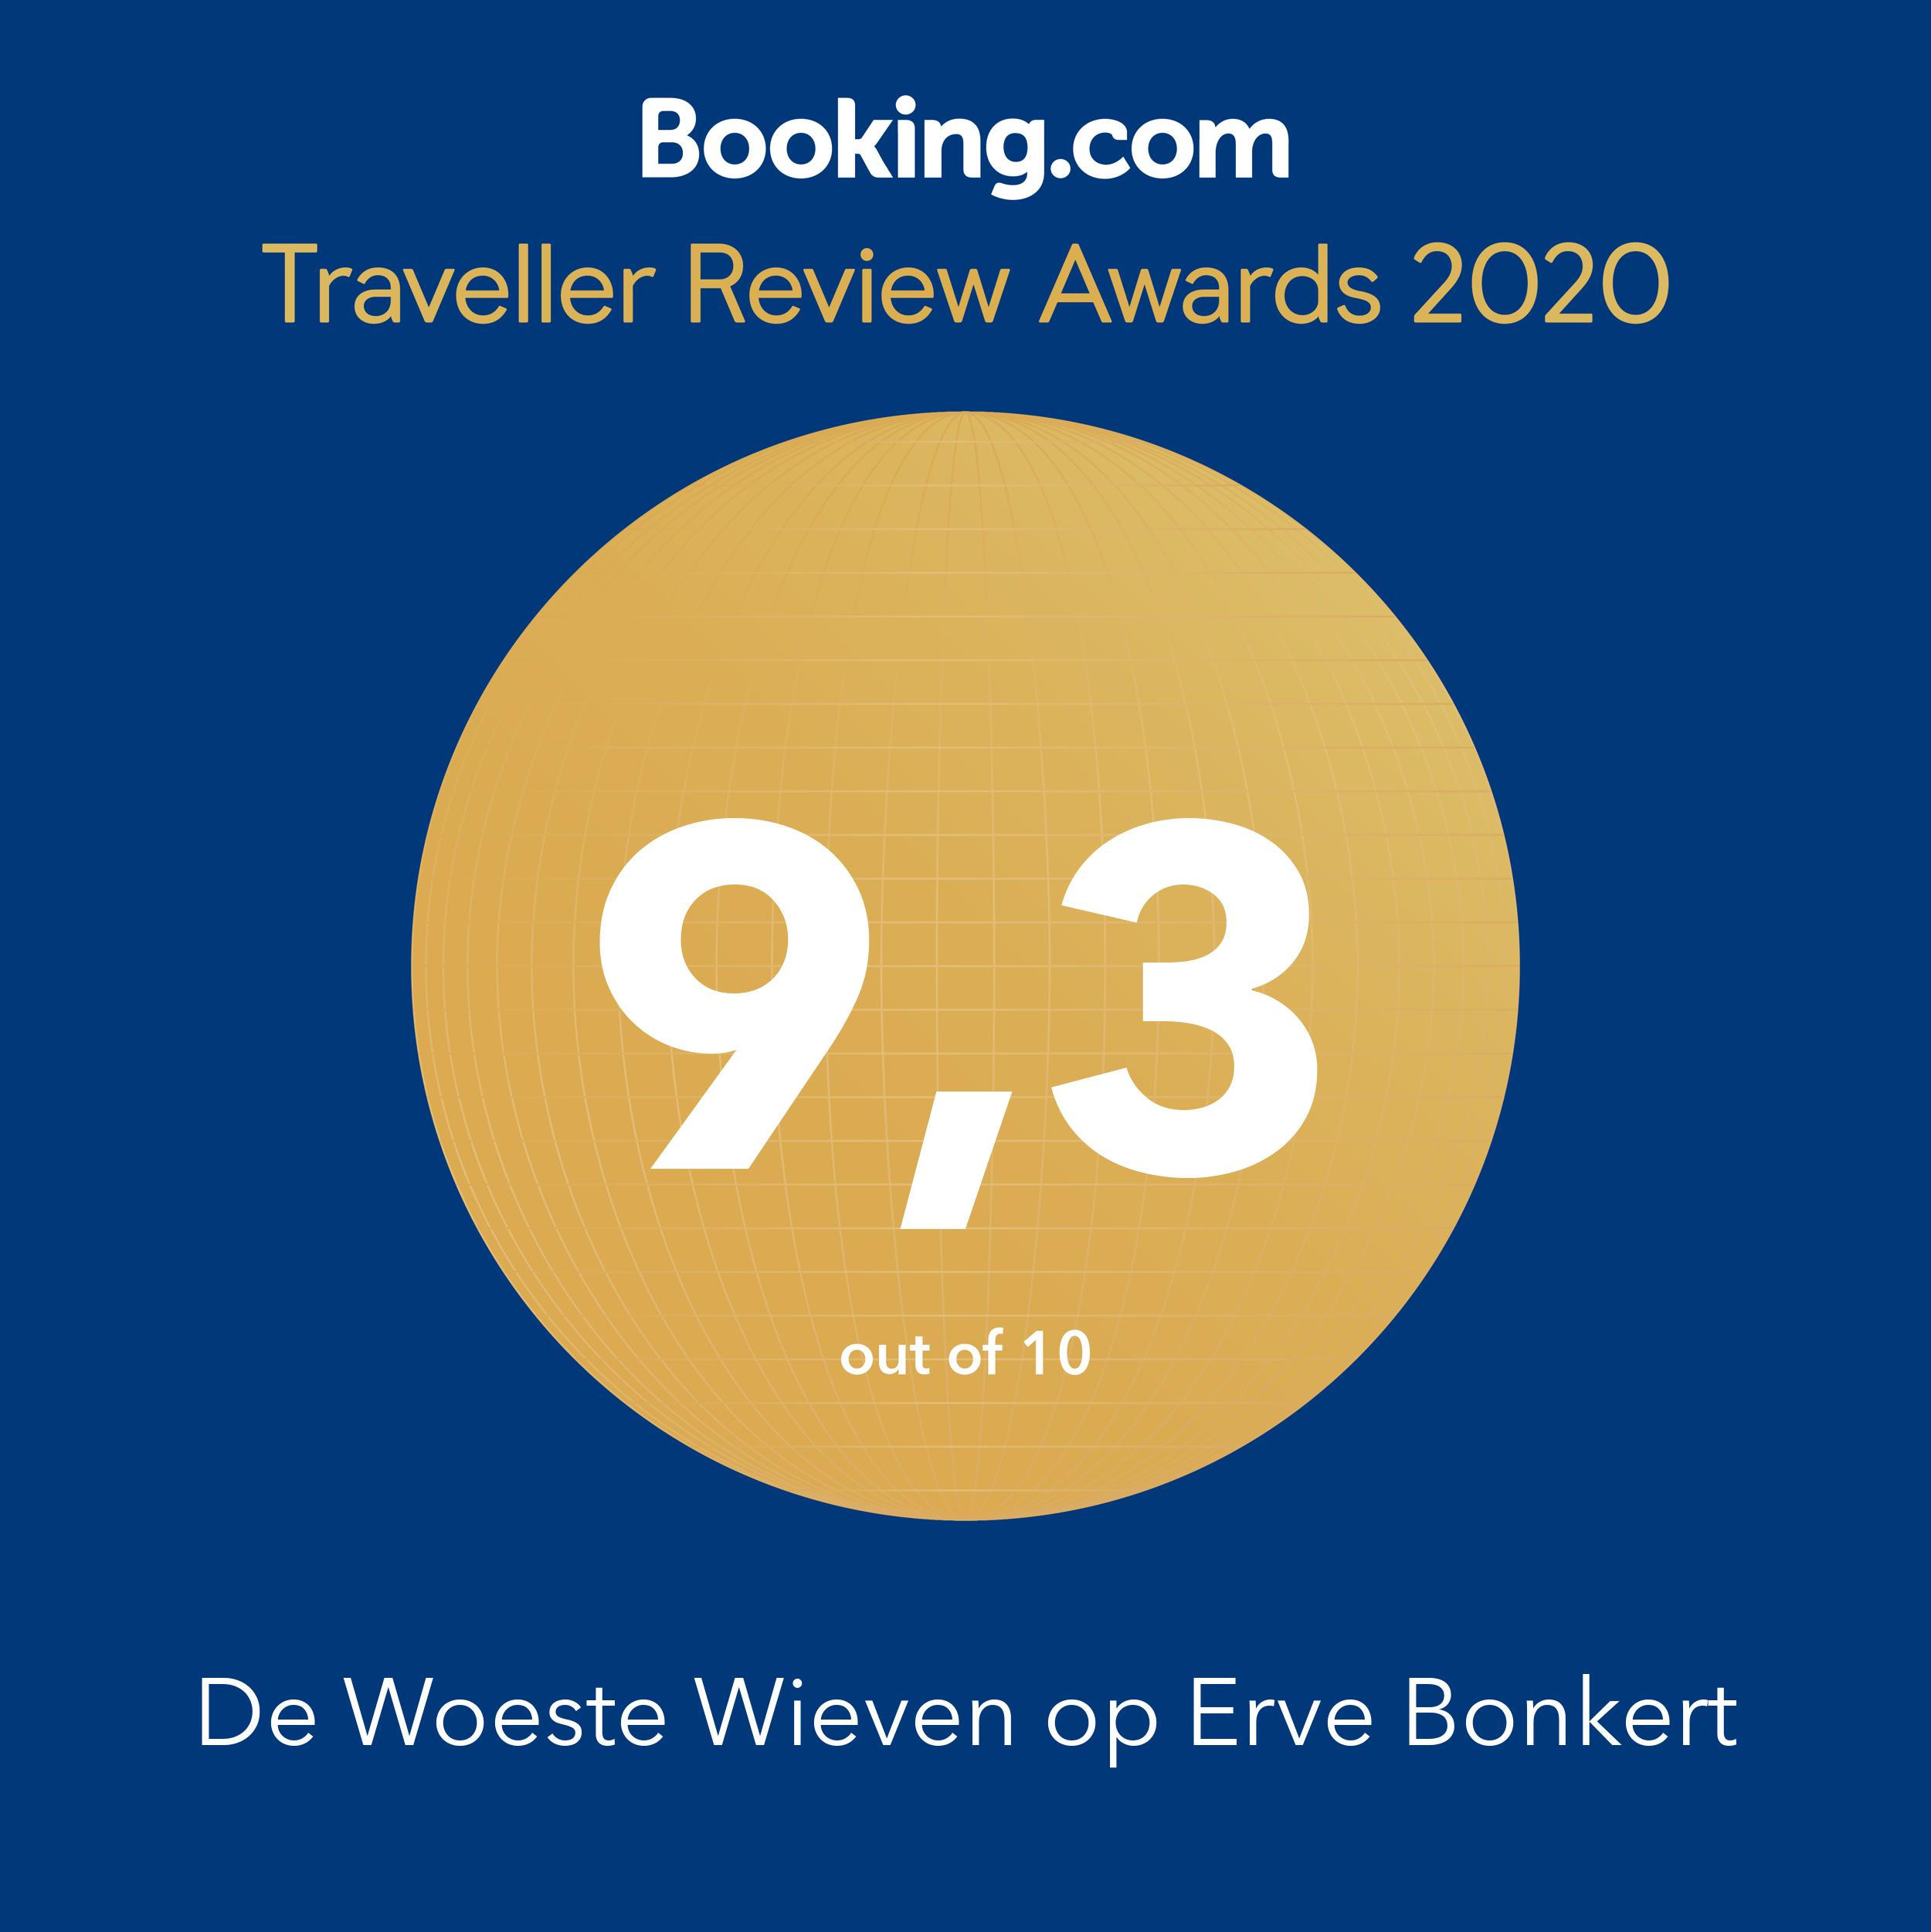 Booking.com award 2020 - De Woeste Wieven op Erve Bonkert